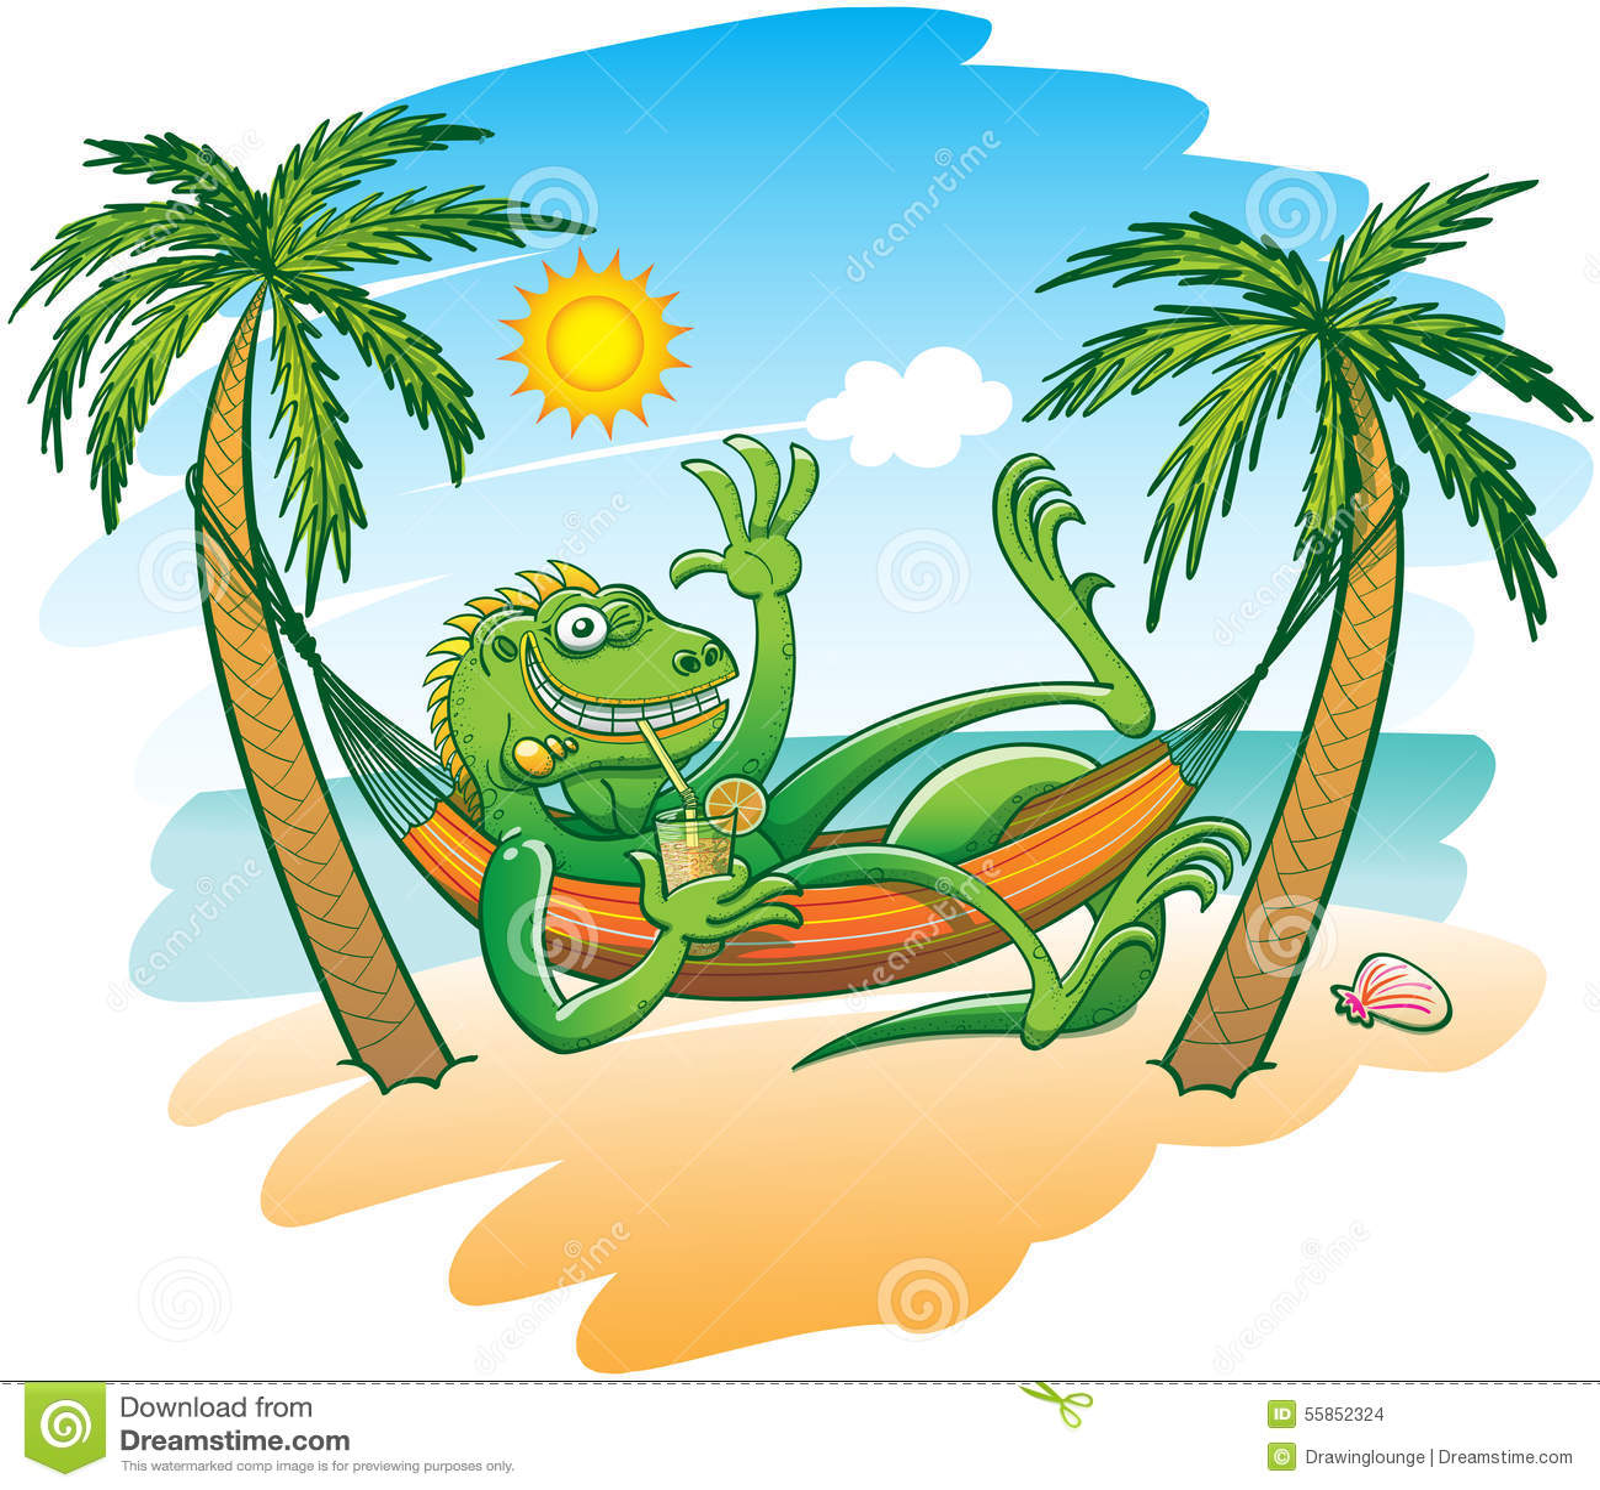 Cool Iguana Enjoying Holidays In A Hammock On The Beach